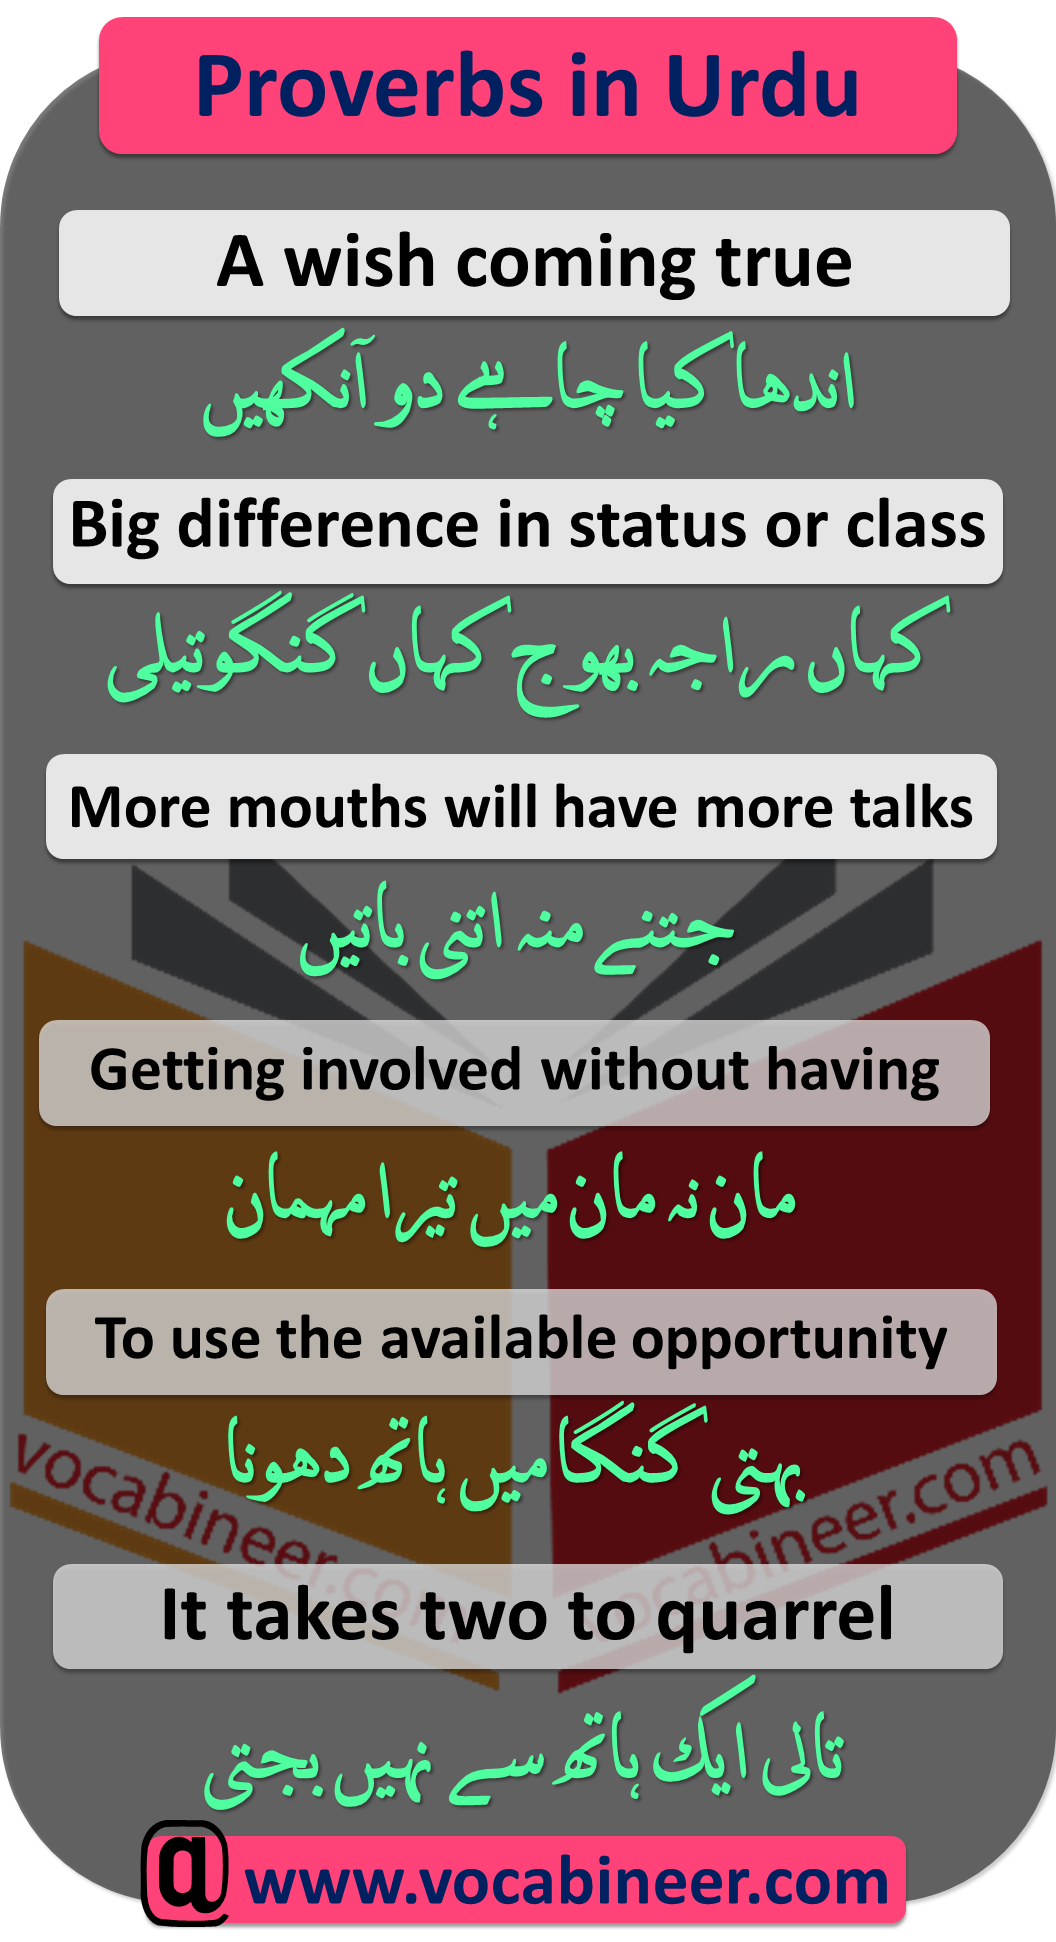 50 Proverbs Meaning In Urdu | Urdu to English Prov